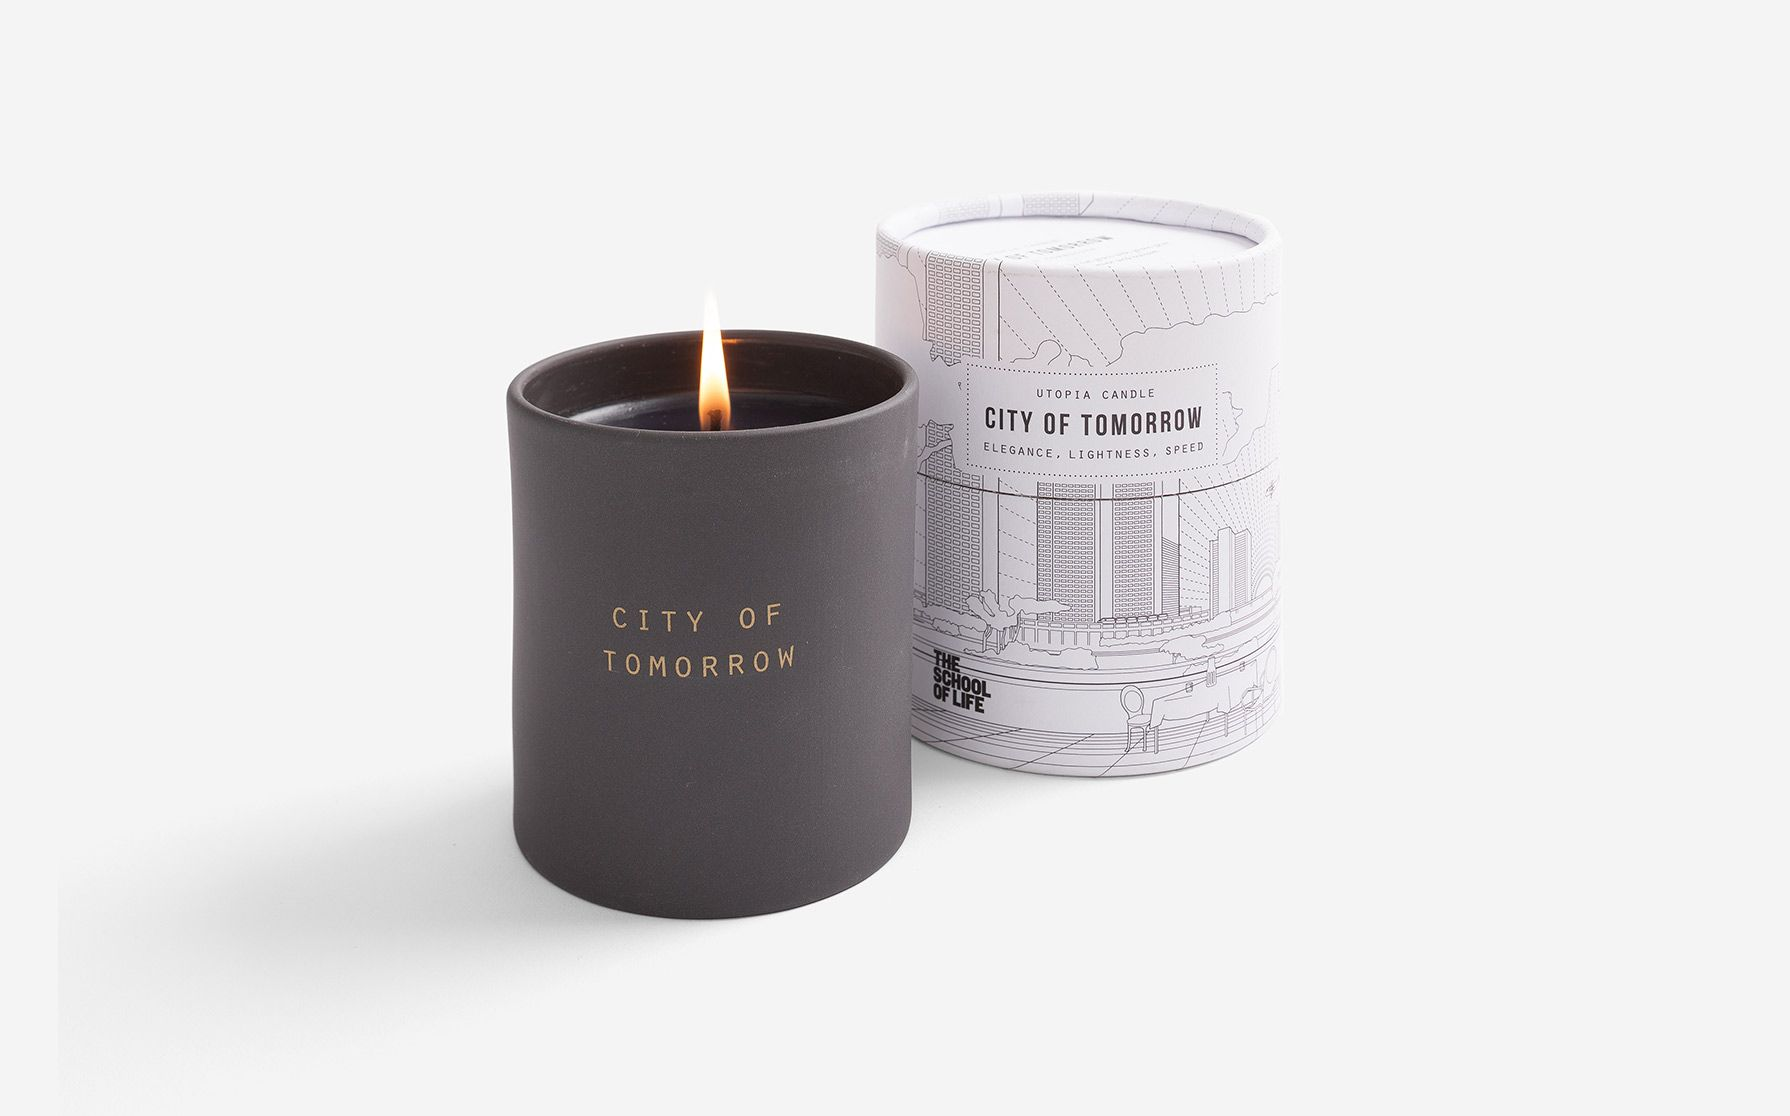 utopia_candle_-_city_of_tomorrow_-_resized_1_.jpg